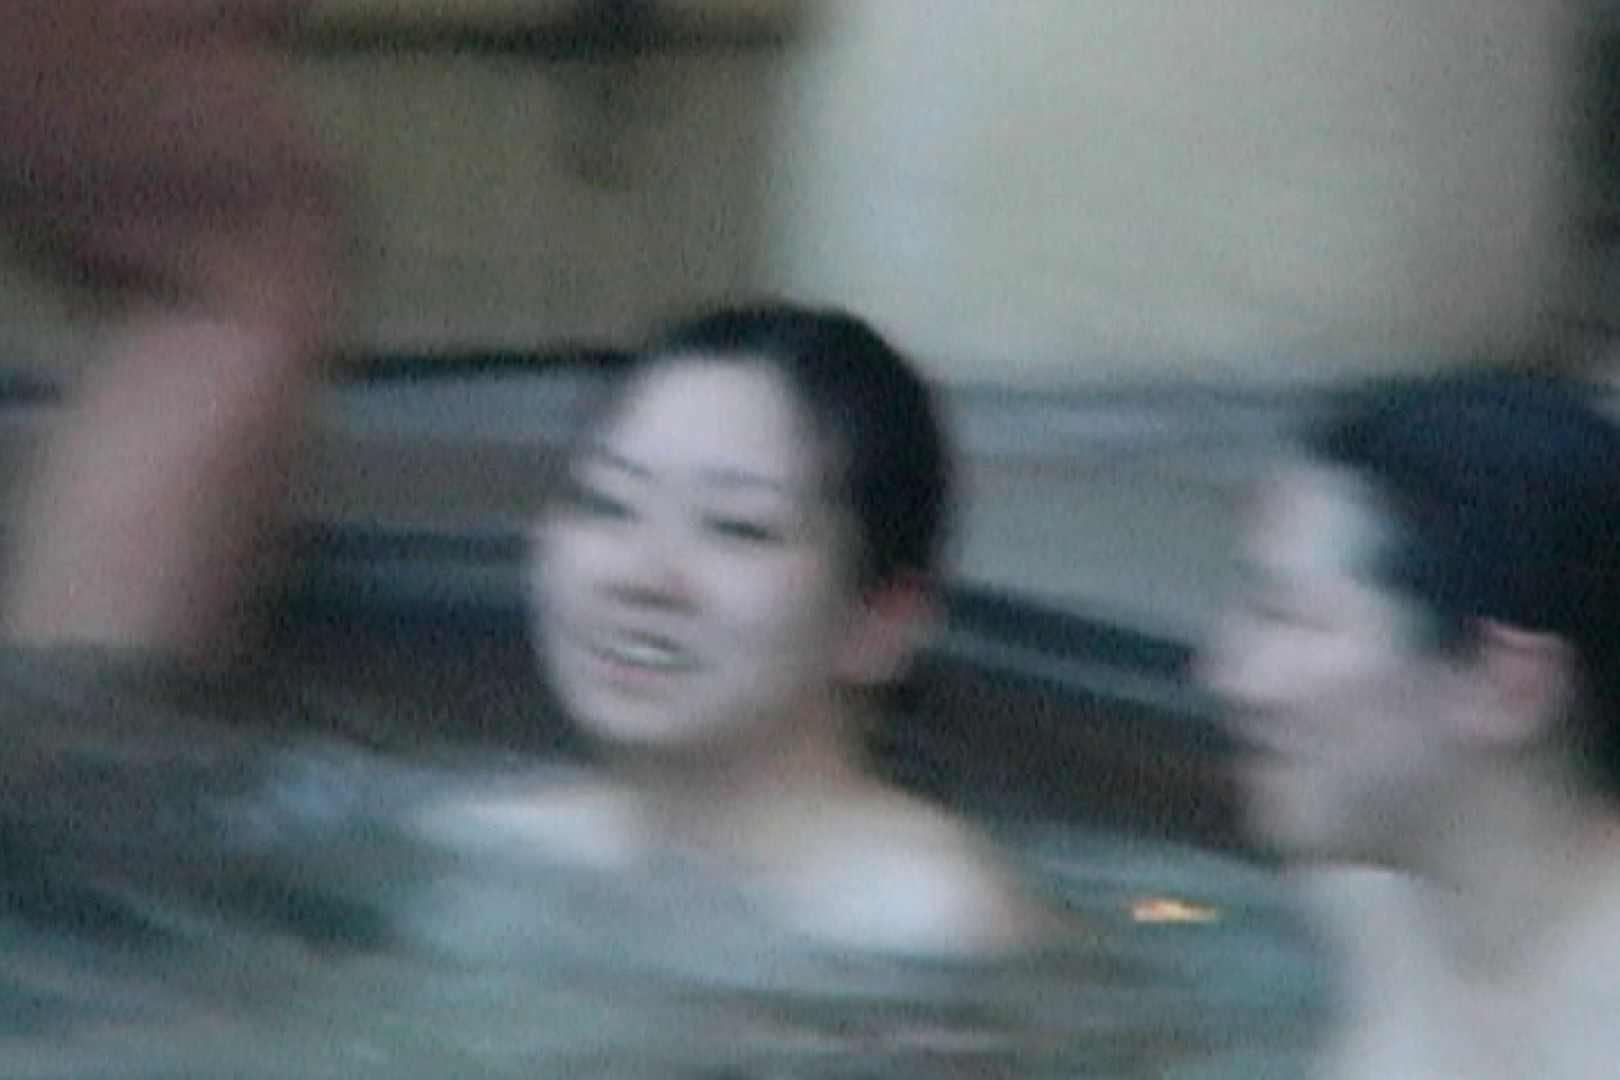 Aquaな露天風呂Vol.598 盗撮師作品 | 露天風呂突入  105pic 43